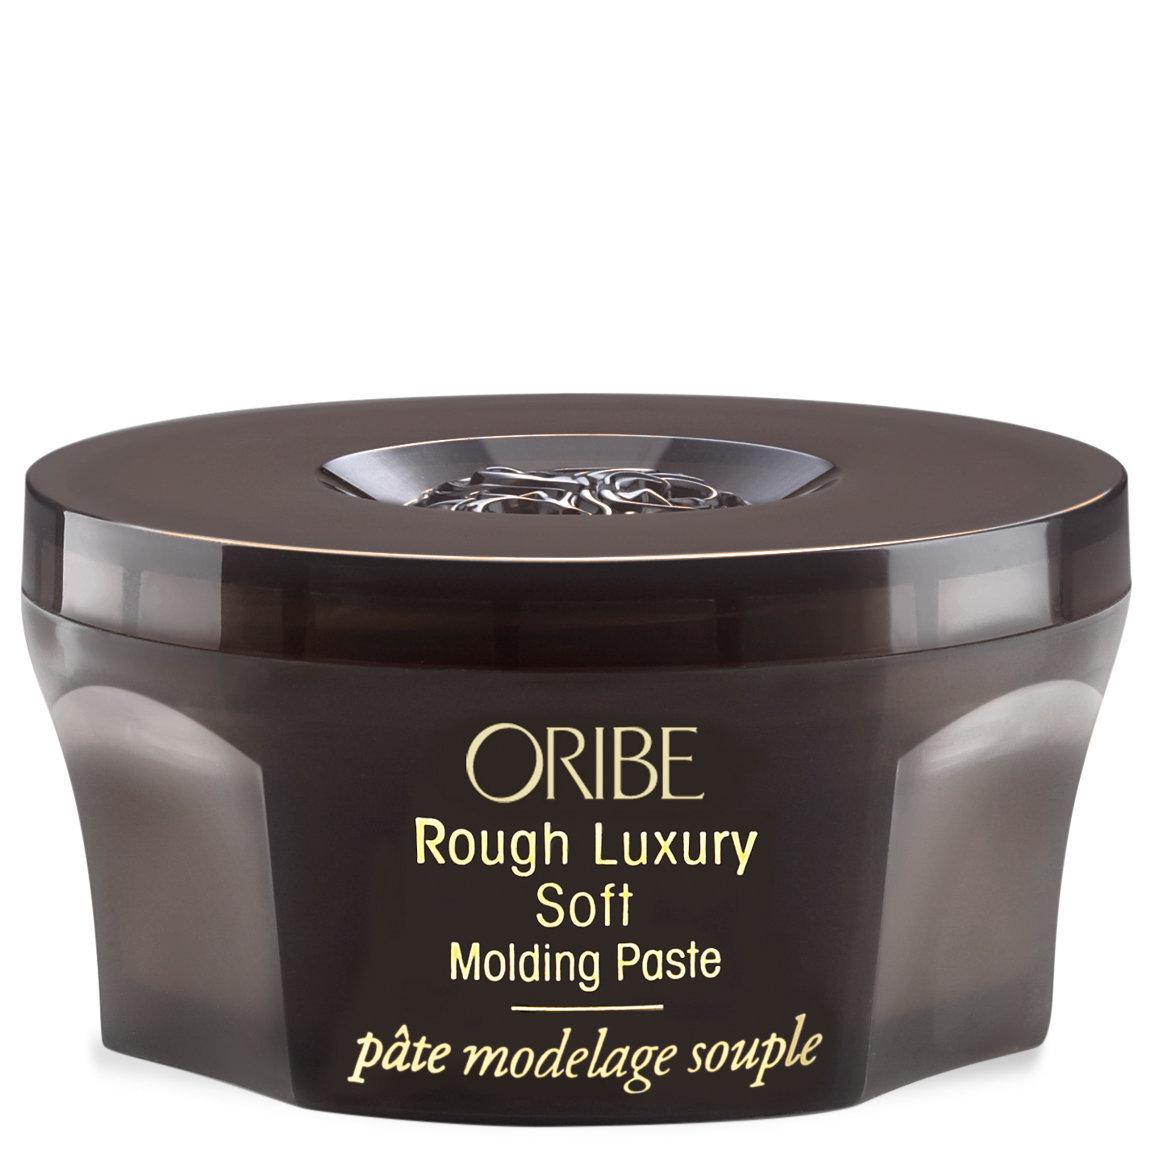 Oribe Rough Luxury Soft Molding Paste alternative view 1 - product swatch.